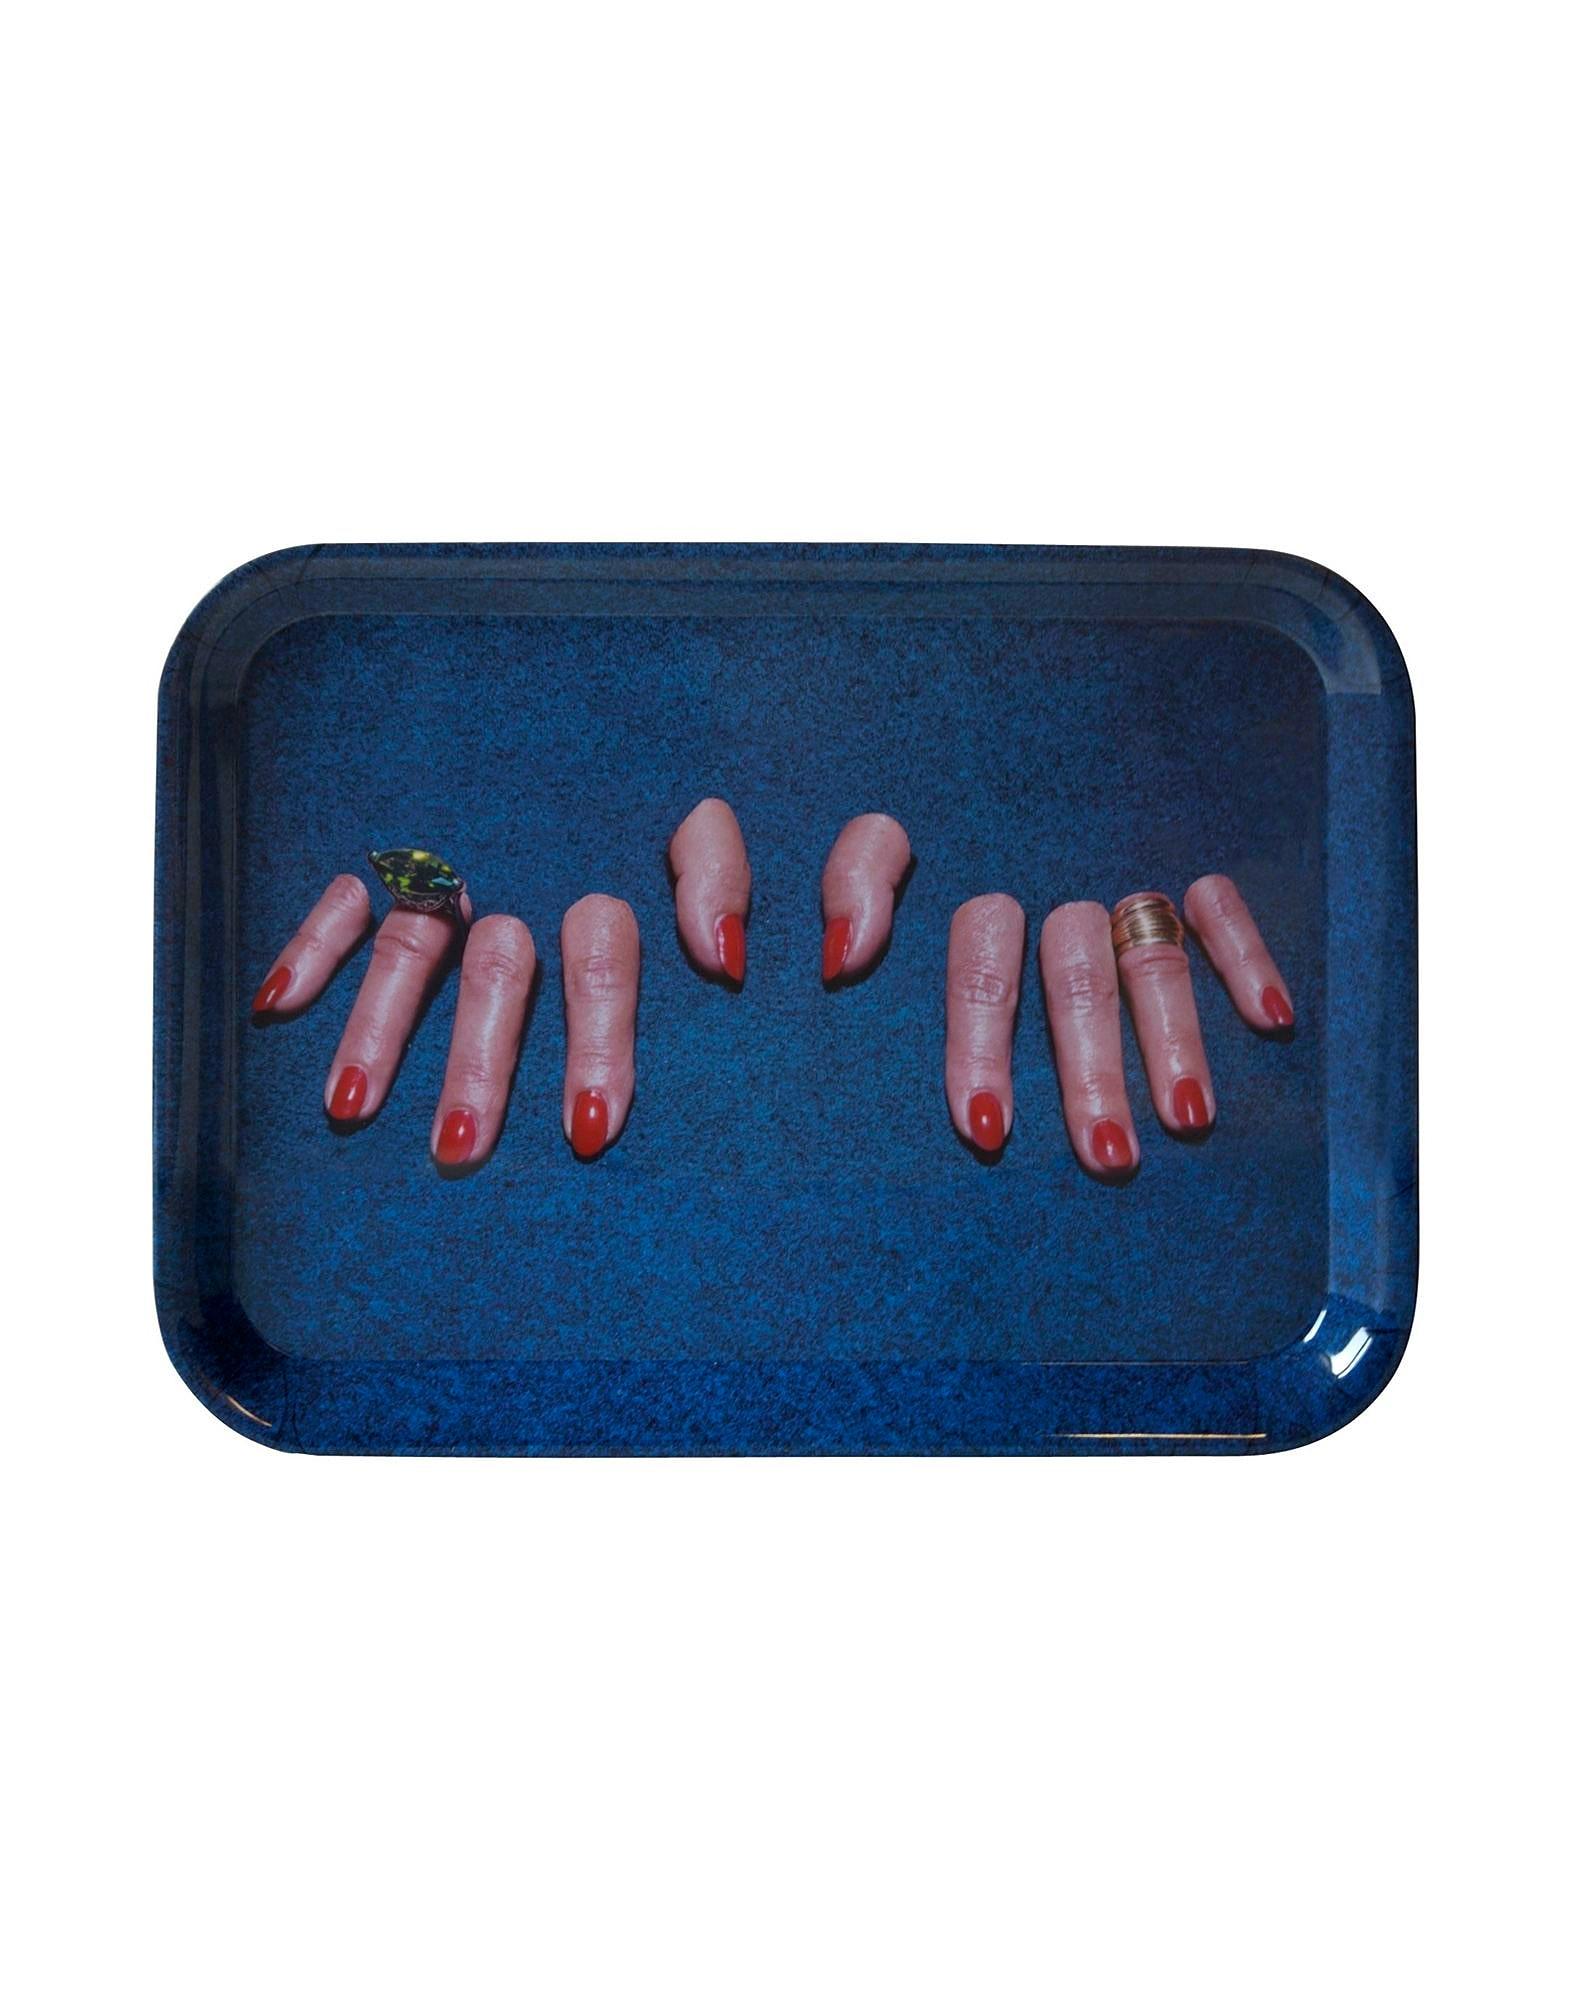 Toilettenpapierablage - Finger - 43 x 32 cm Mehrfarbig   Seletti Blau Maurizio Cattelan   Pierpaolo Ferrari